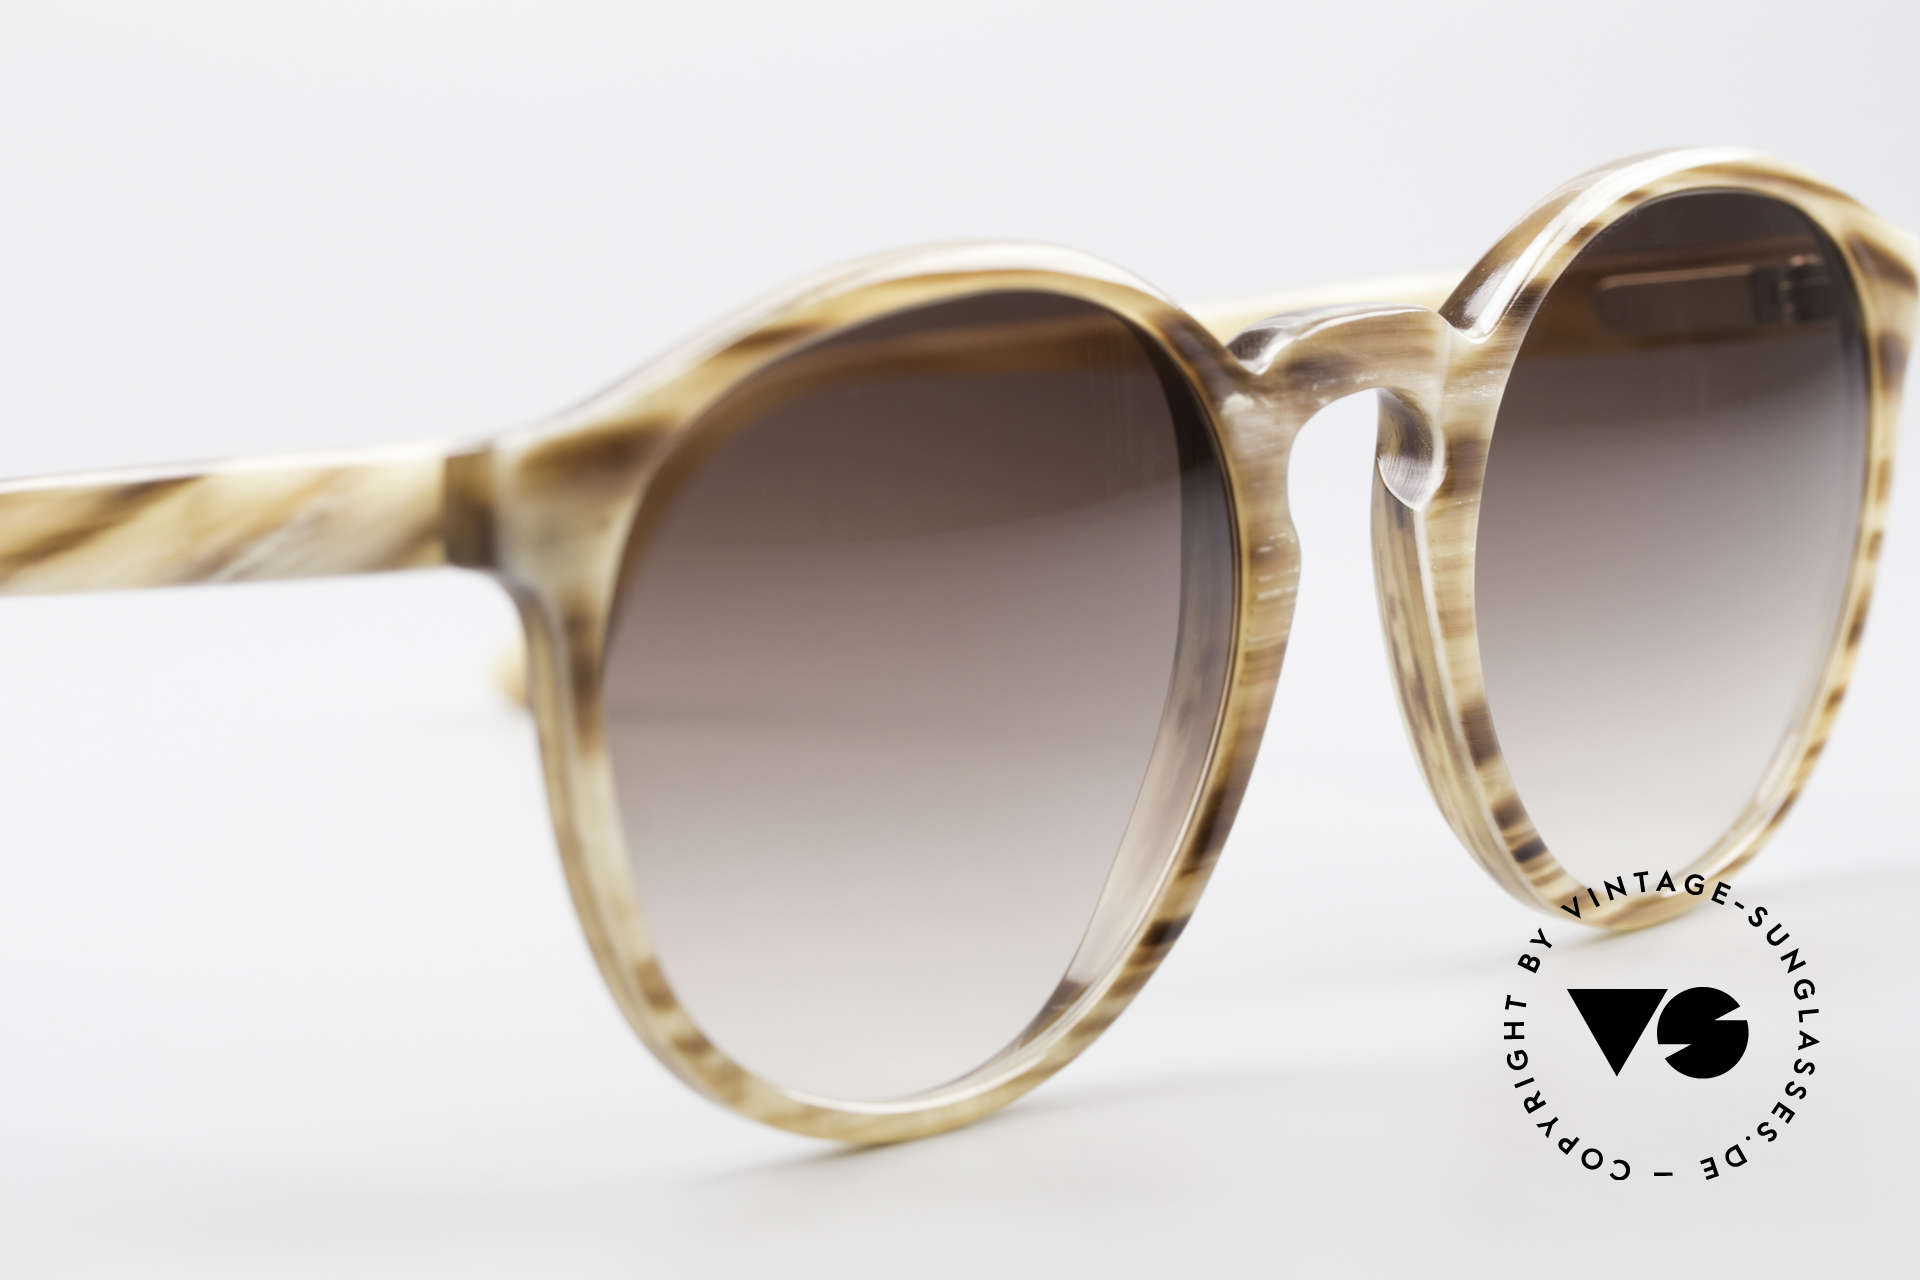 Hartmanns H42 Horn Johnny Depp Style Sunglasses, spiritual / intellectual frame design (PANTO shades), Made for Men